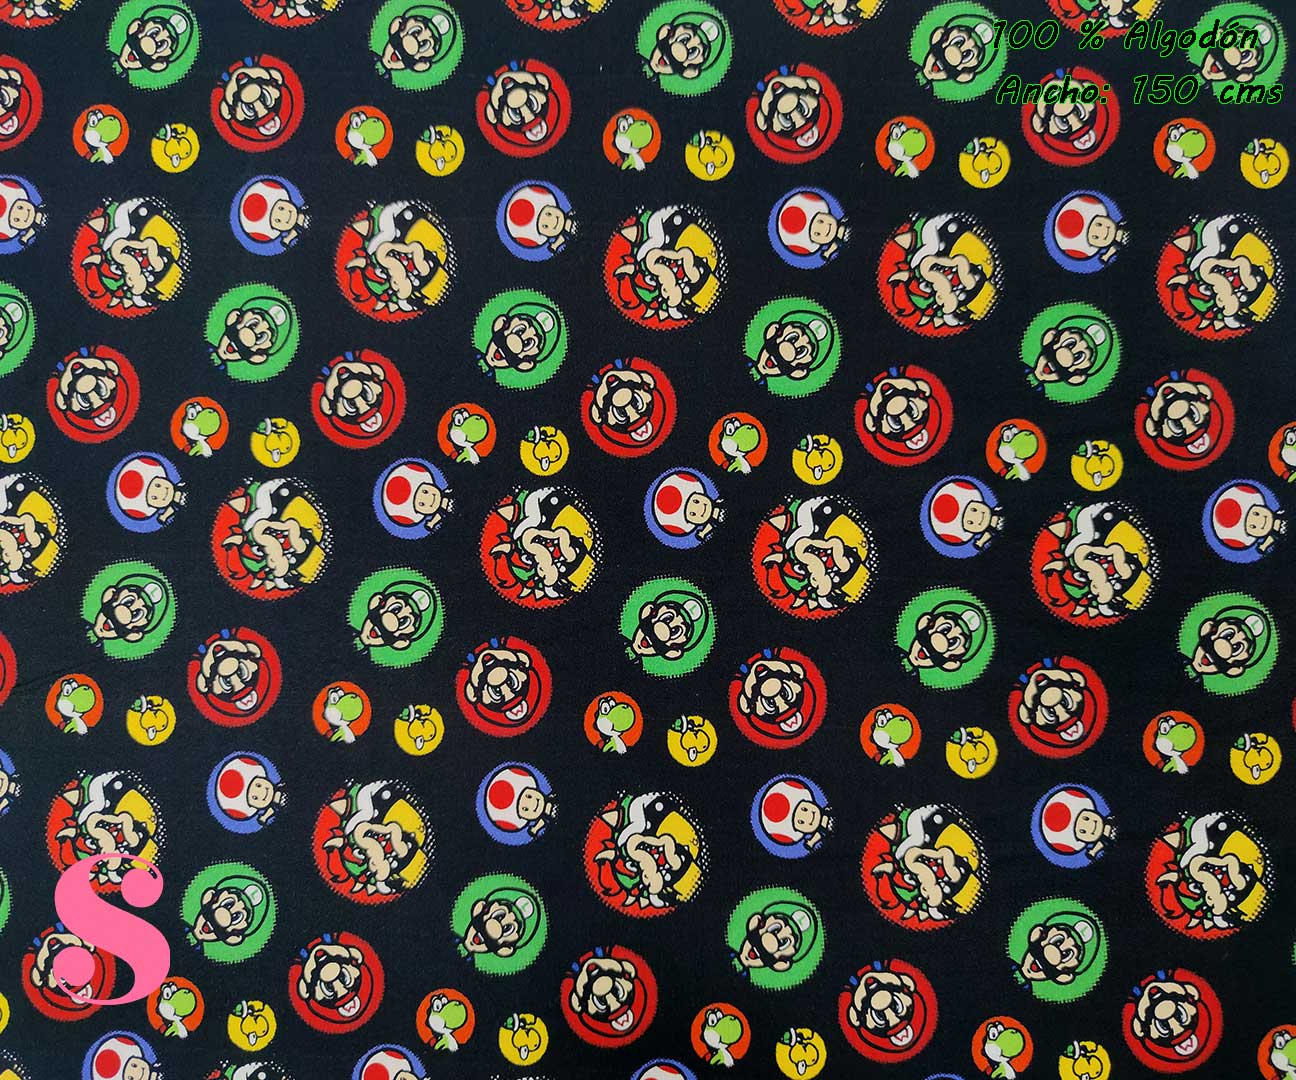 tejidos-estampados-de-algodón,-telas-frikis,telas-estampadas-de-moda,Tejido Estampado Super Mario & Luigi and friends